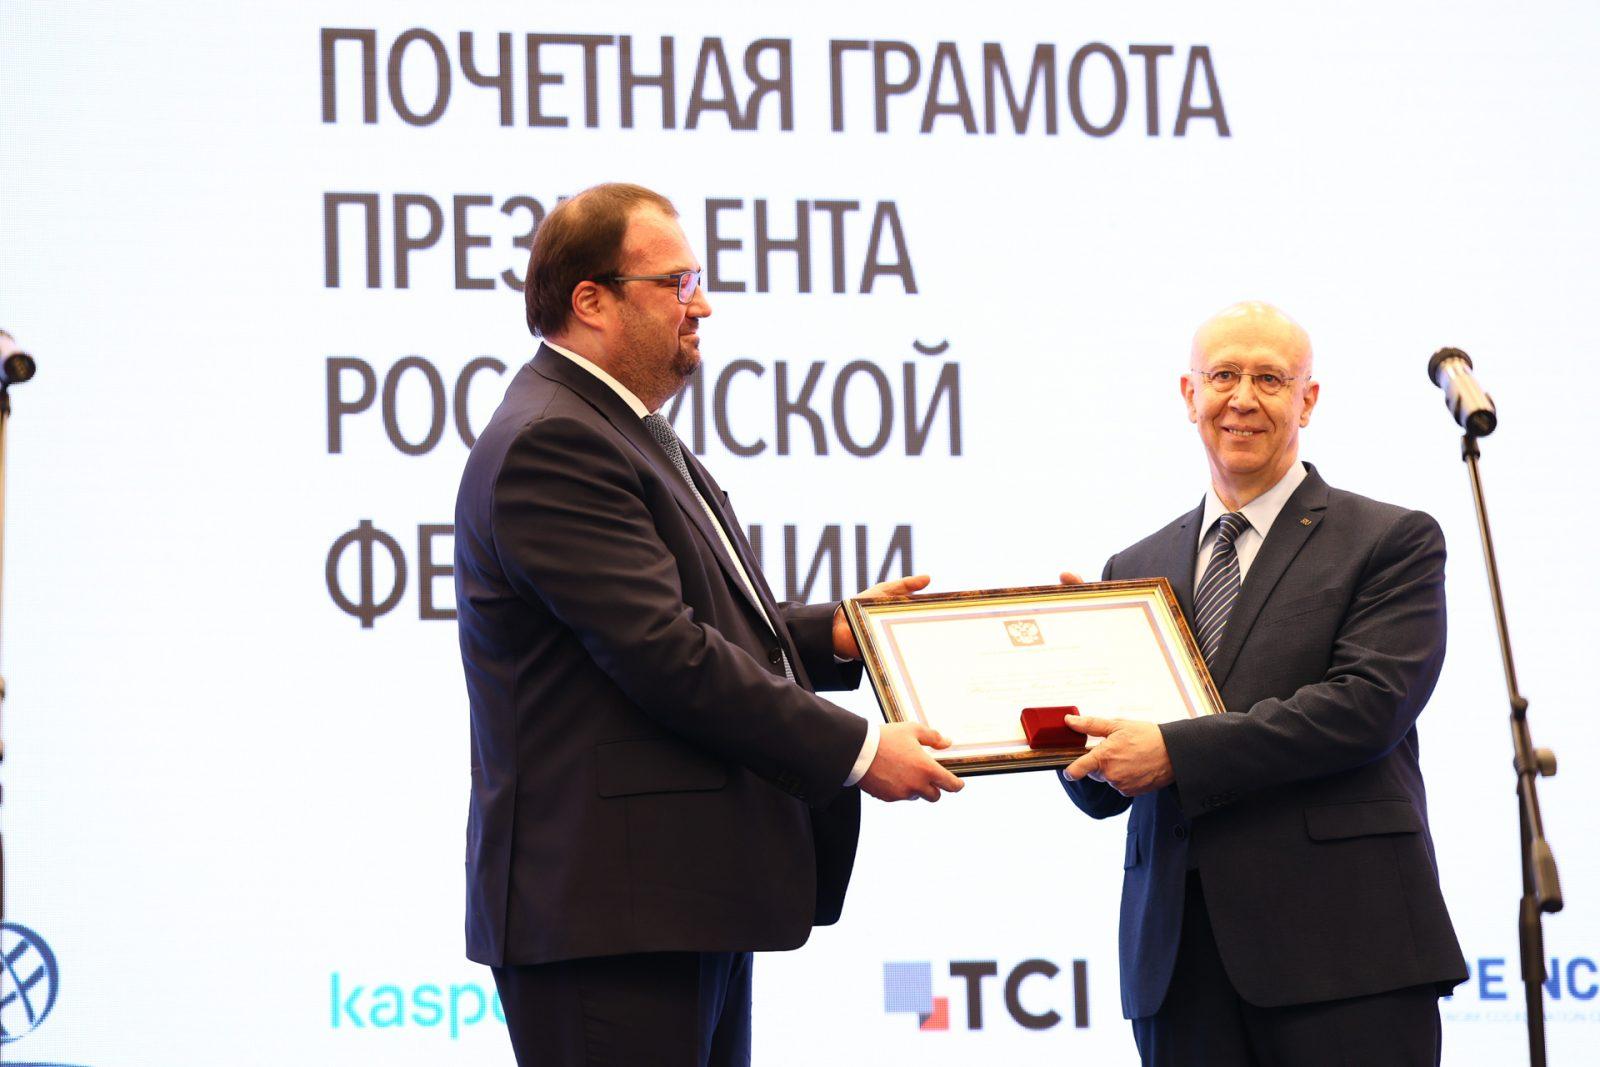 На RIGF-2021 вручены награды героям Рунета (фотолента)